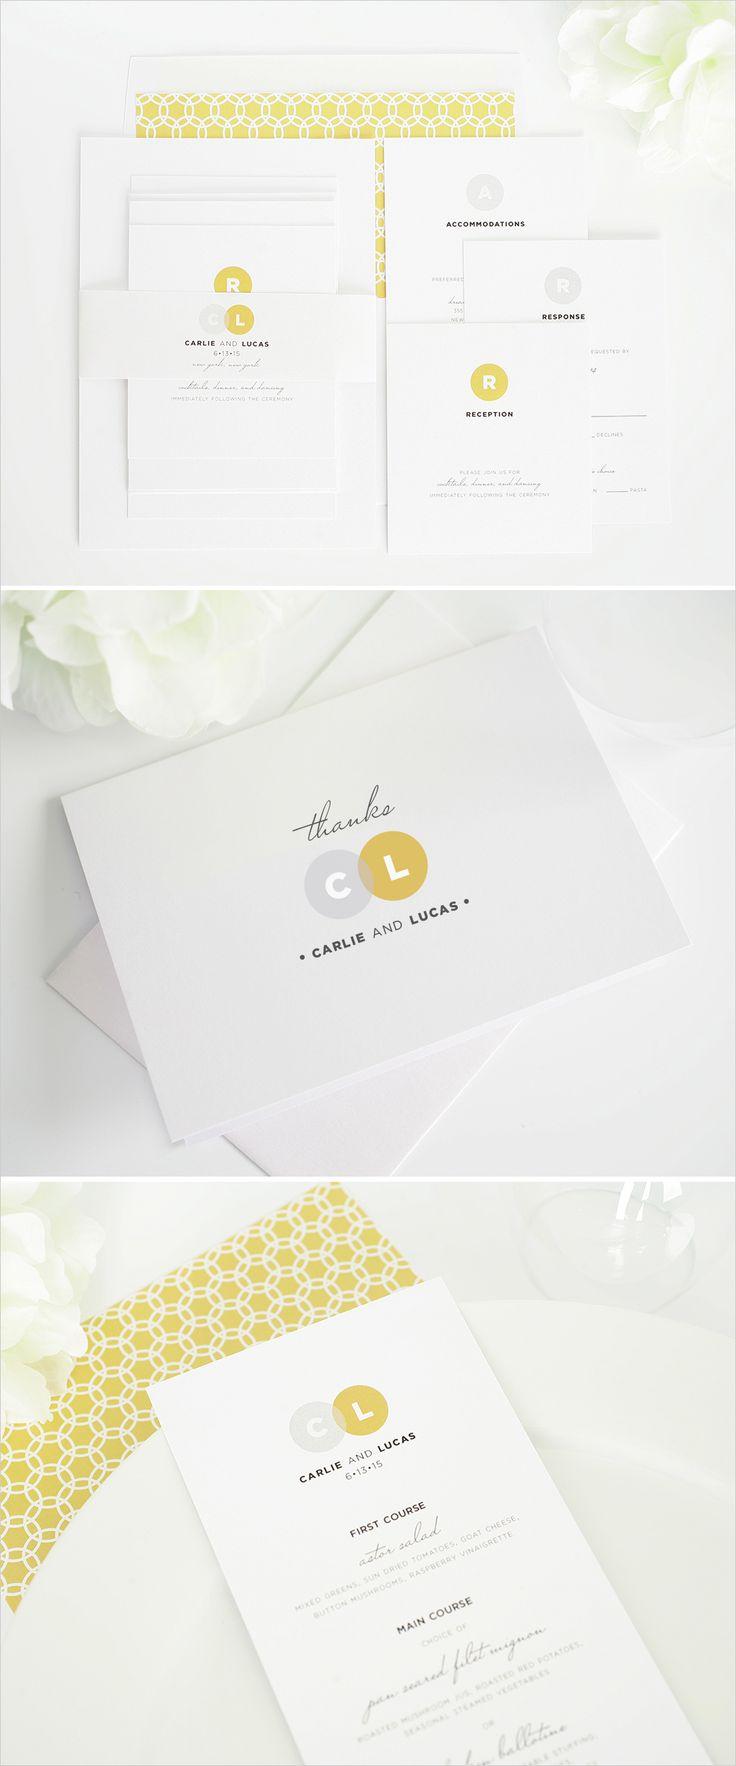 Circle couple wedding invitations. #stationery #invitations #savethedate #rsvp #wedding http://www.shineweddinginvitations.com/wedding-invitations/circle-couple-wedding-invitations